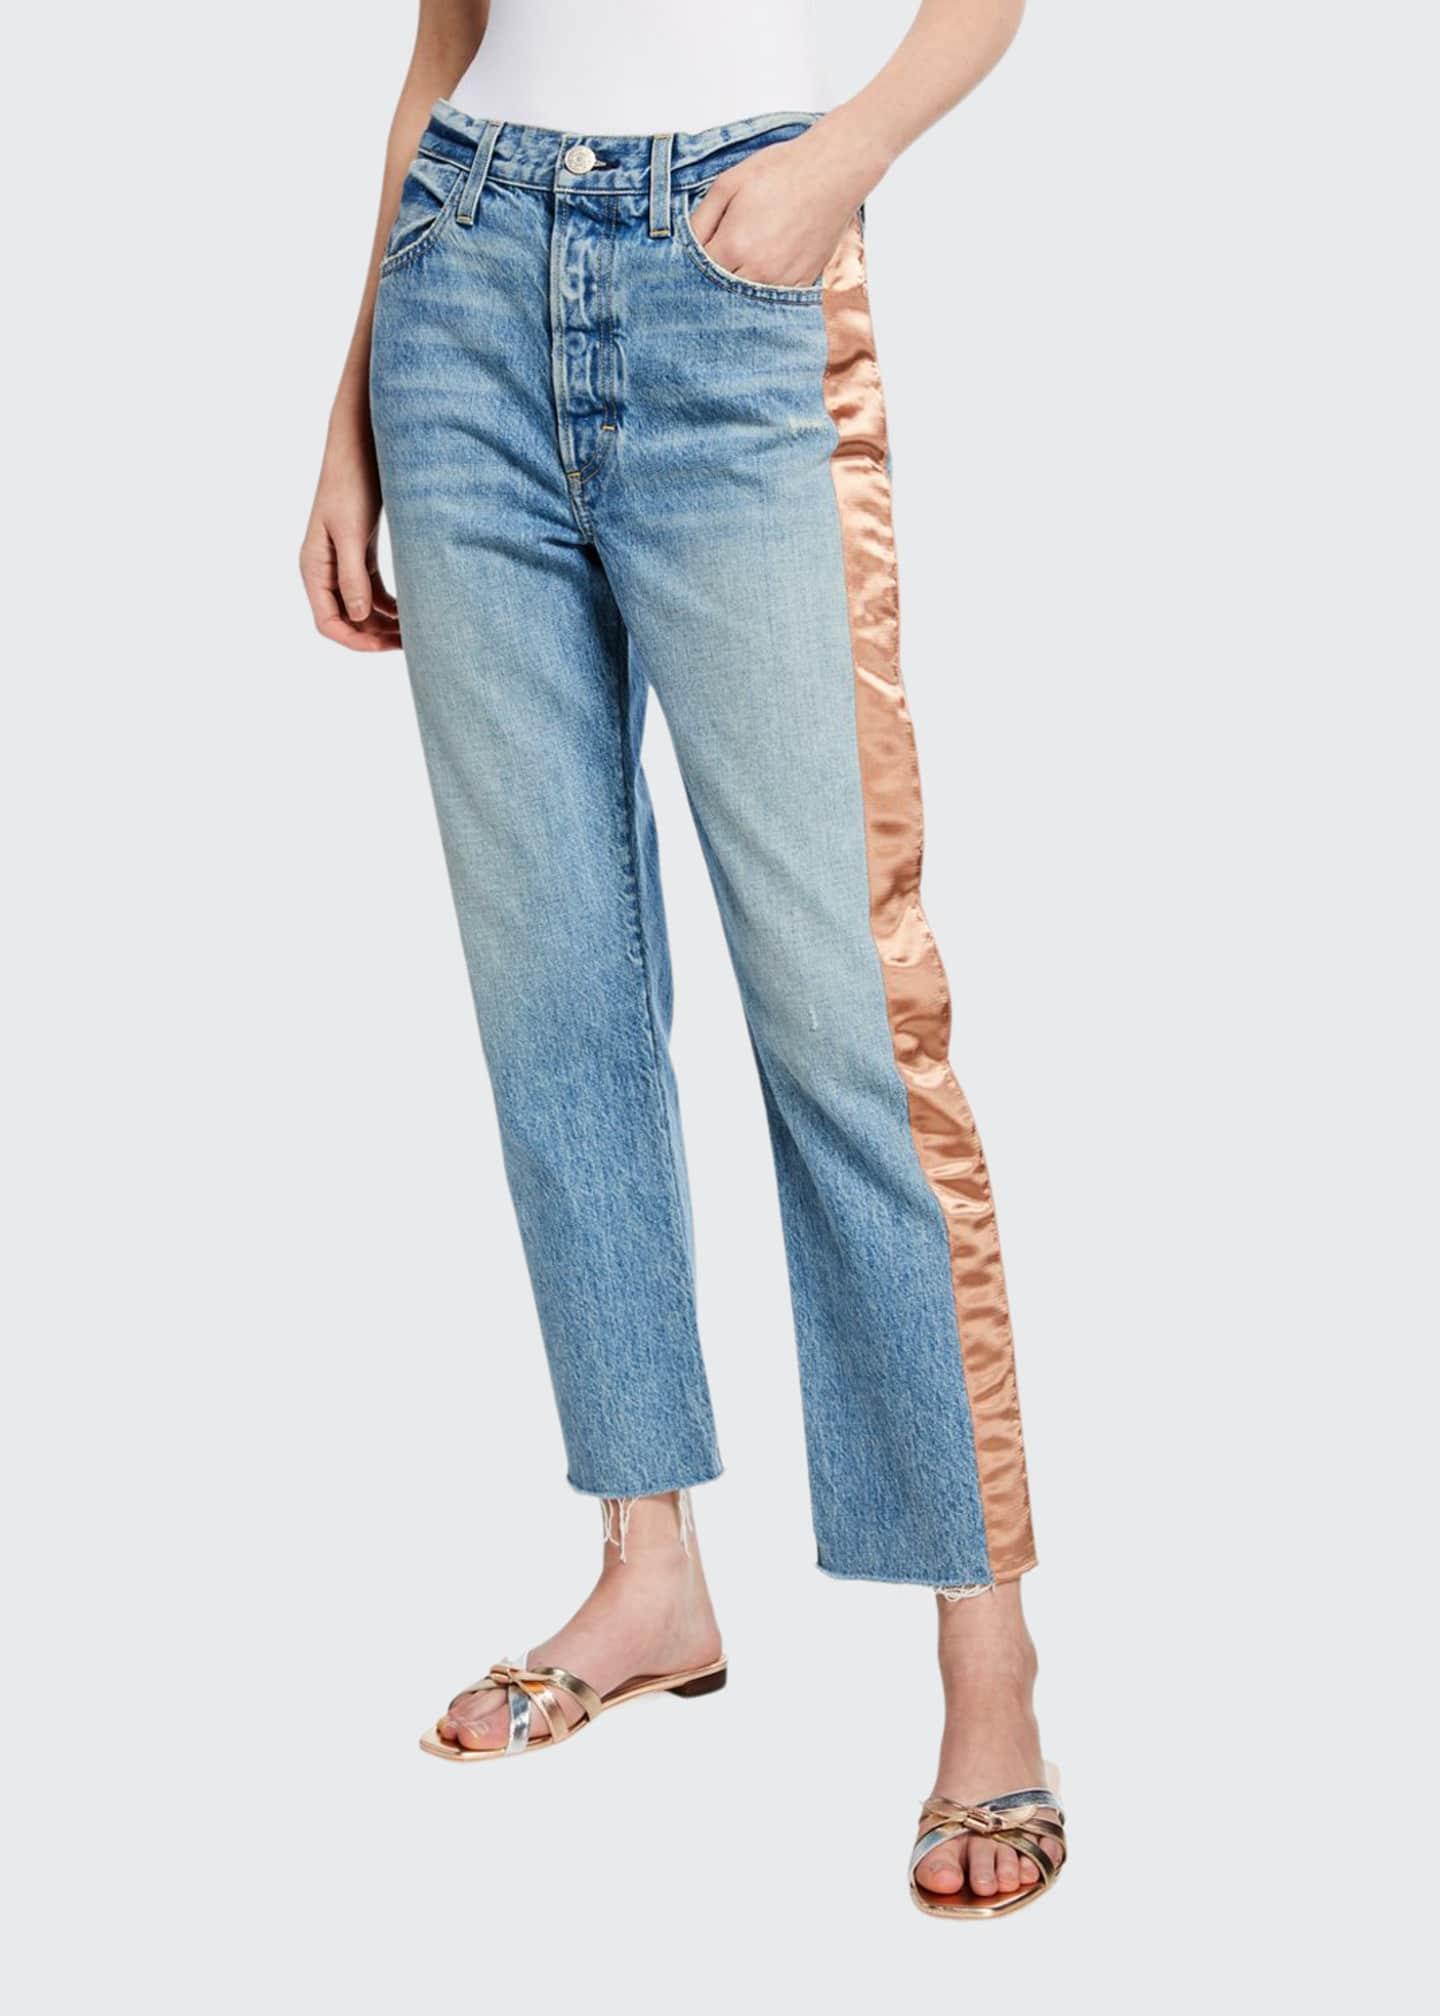 AMO Denim Ribbon Loverboy Jeans